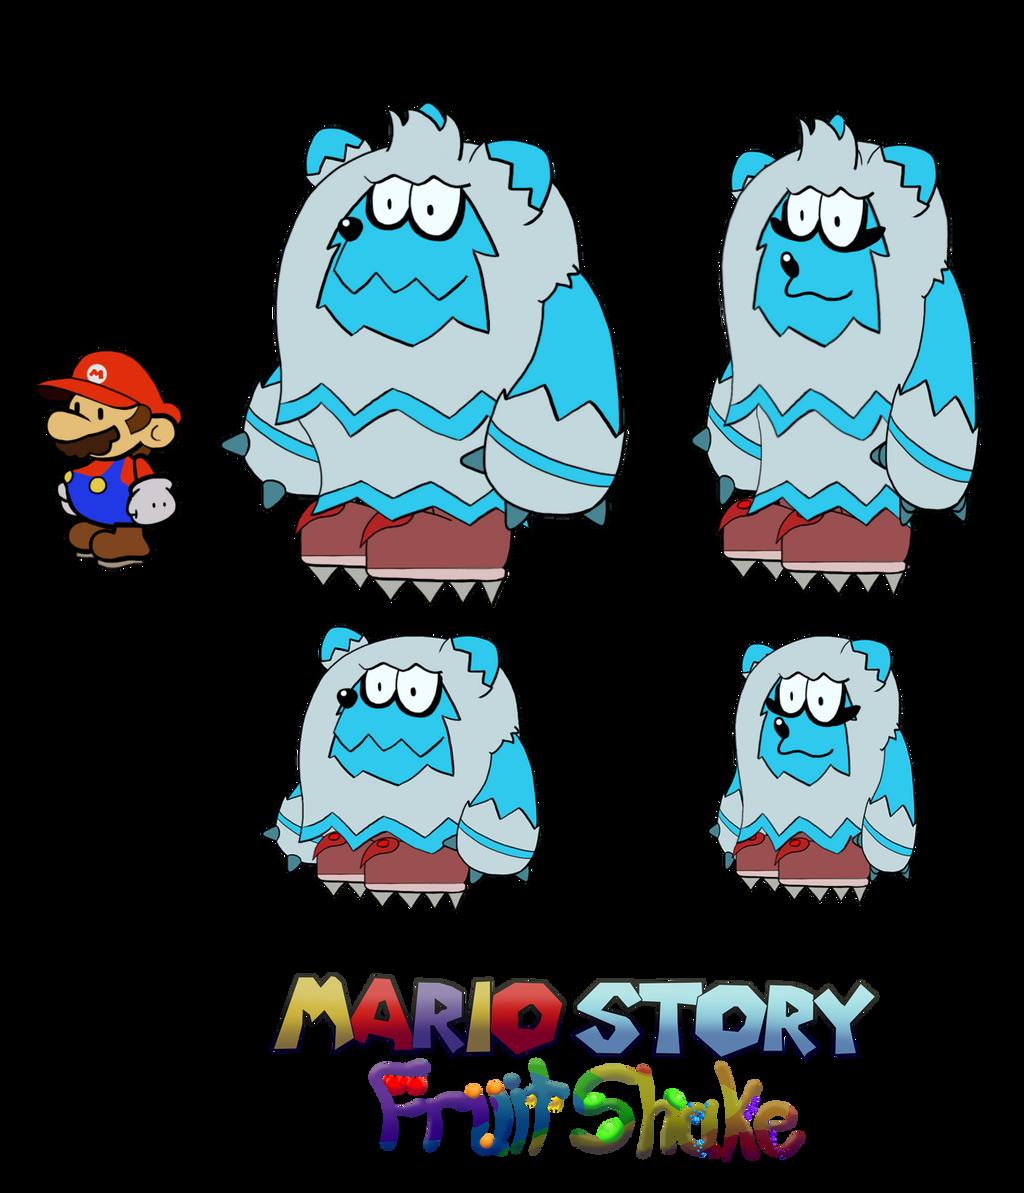 Grizzetis (Mario Story Fruit Shake) by DerekminyA